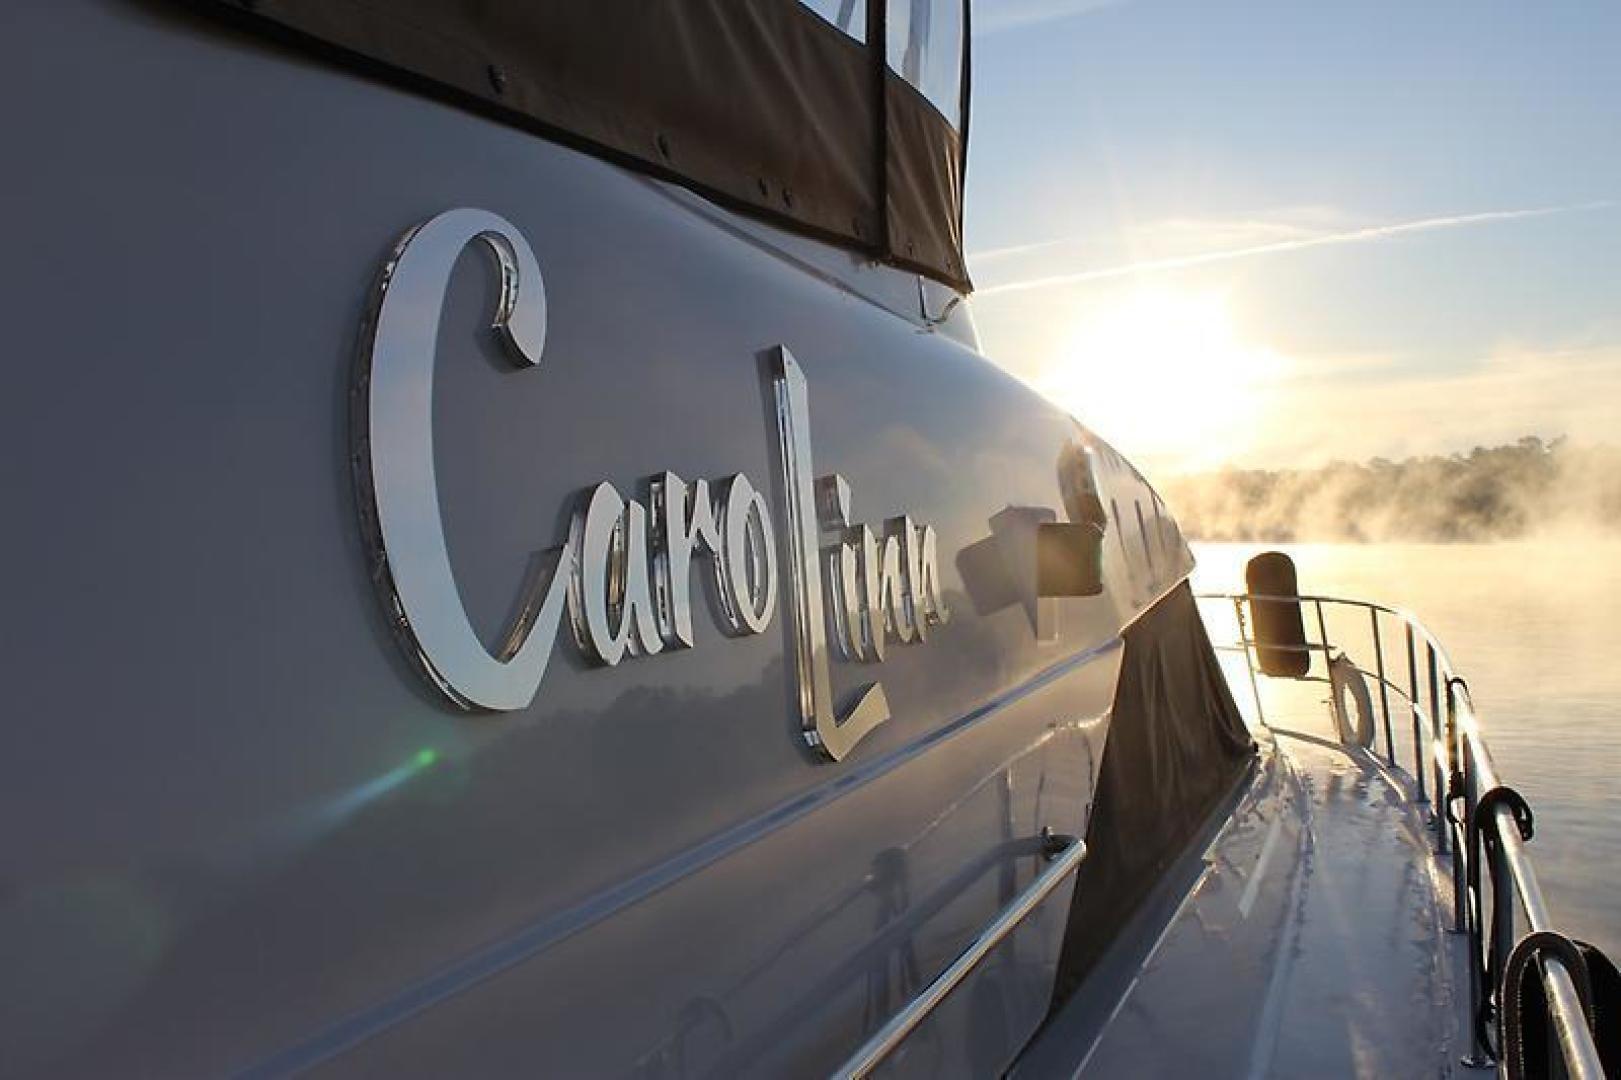 Picure of Carolinn